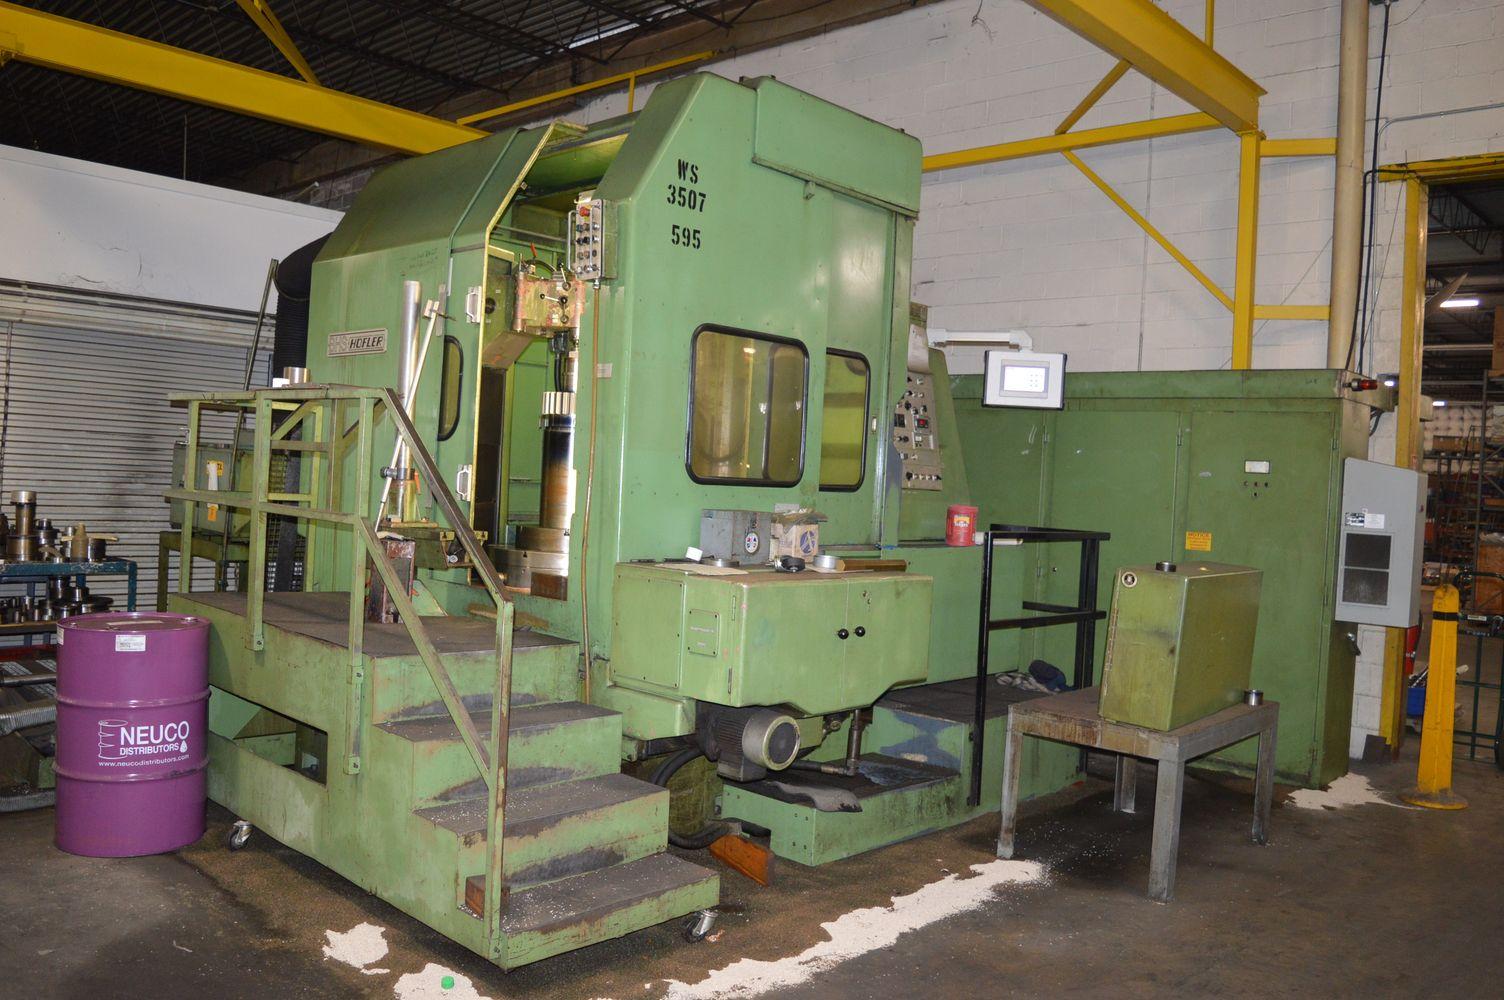 Multishop Metalworking Machinery Auction